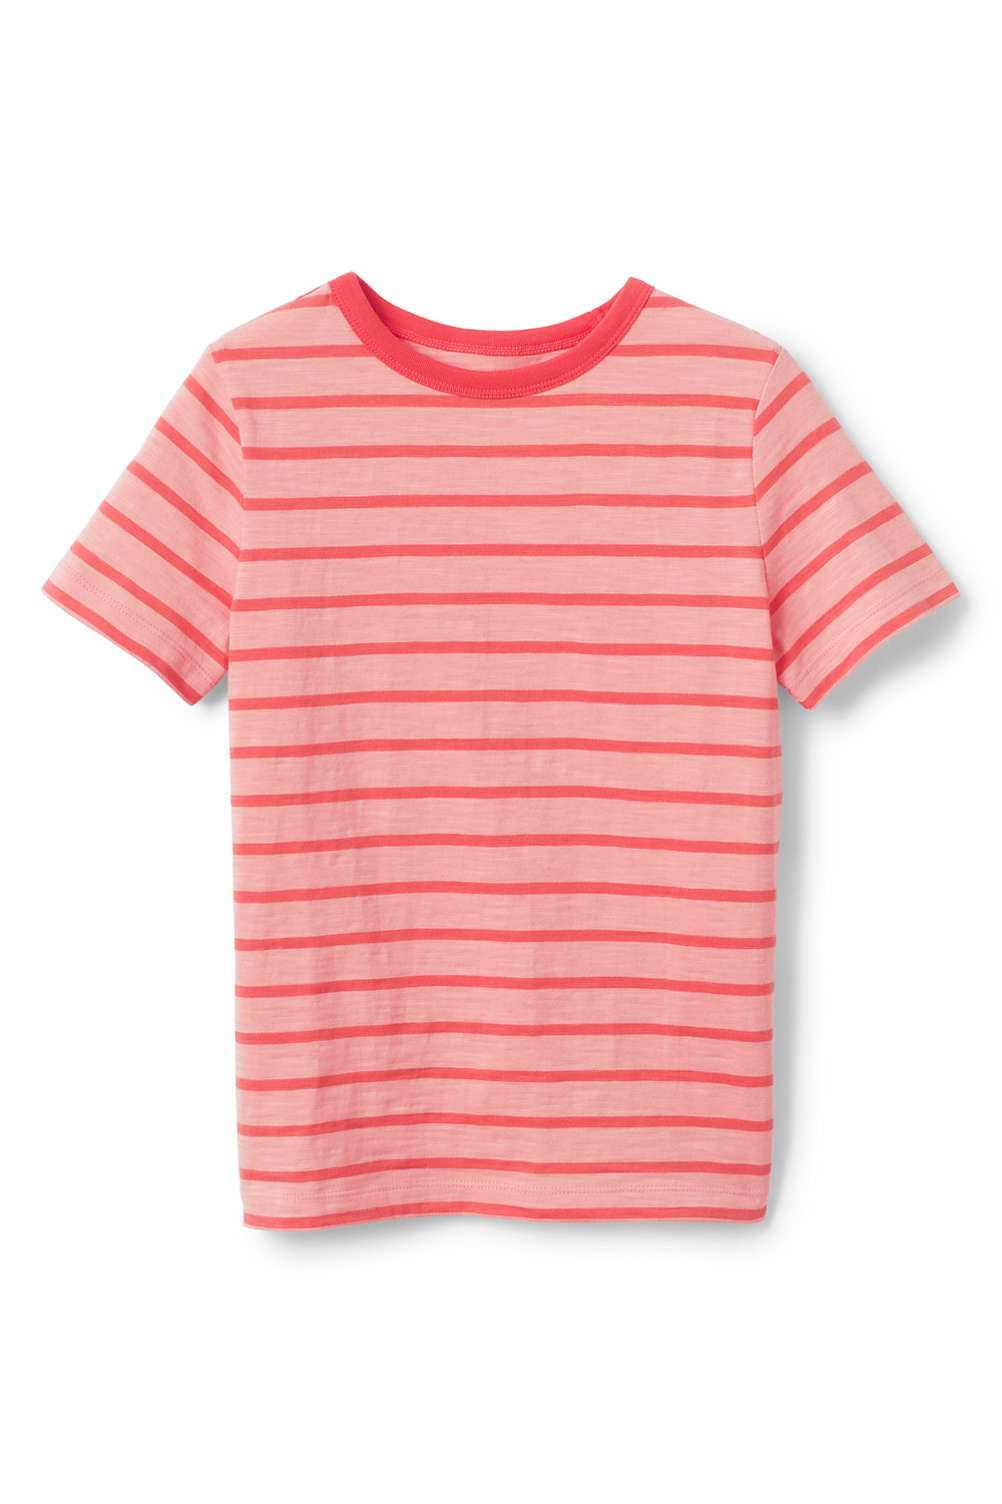 8017a3e316e230 Toddler Boys Stripe Slub T Shirt from Lands' End